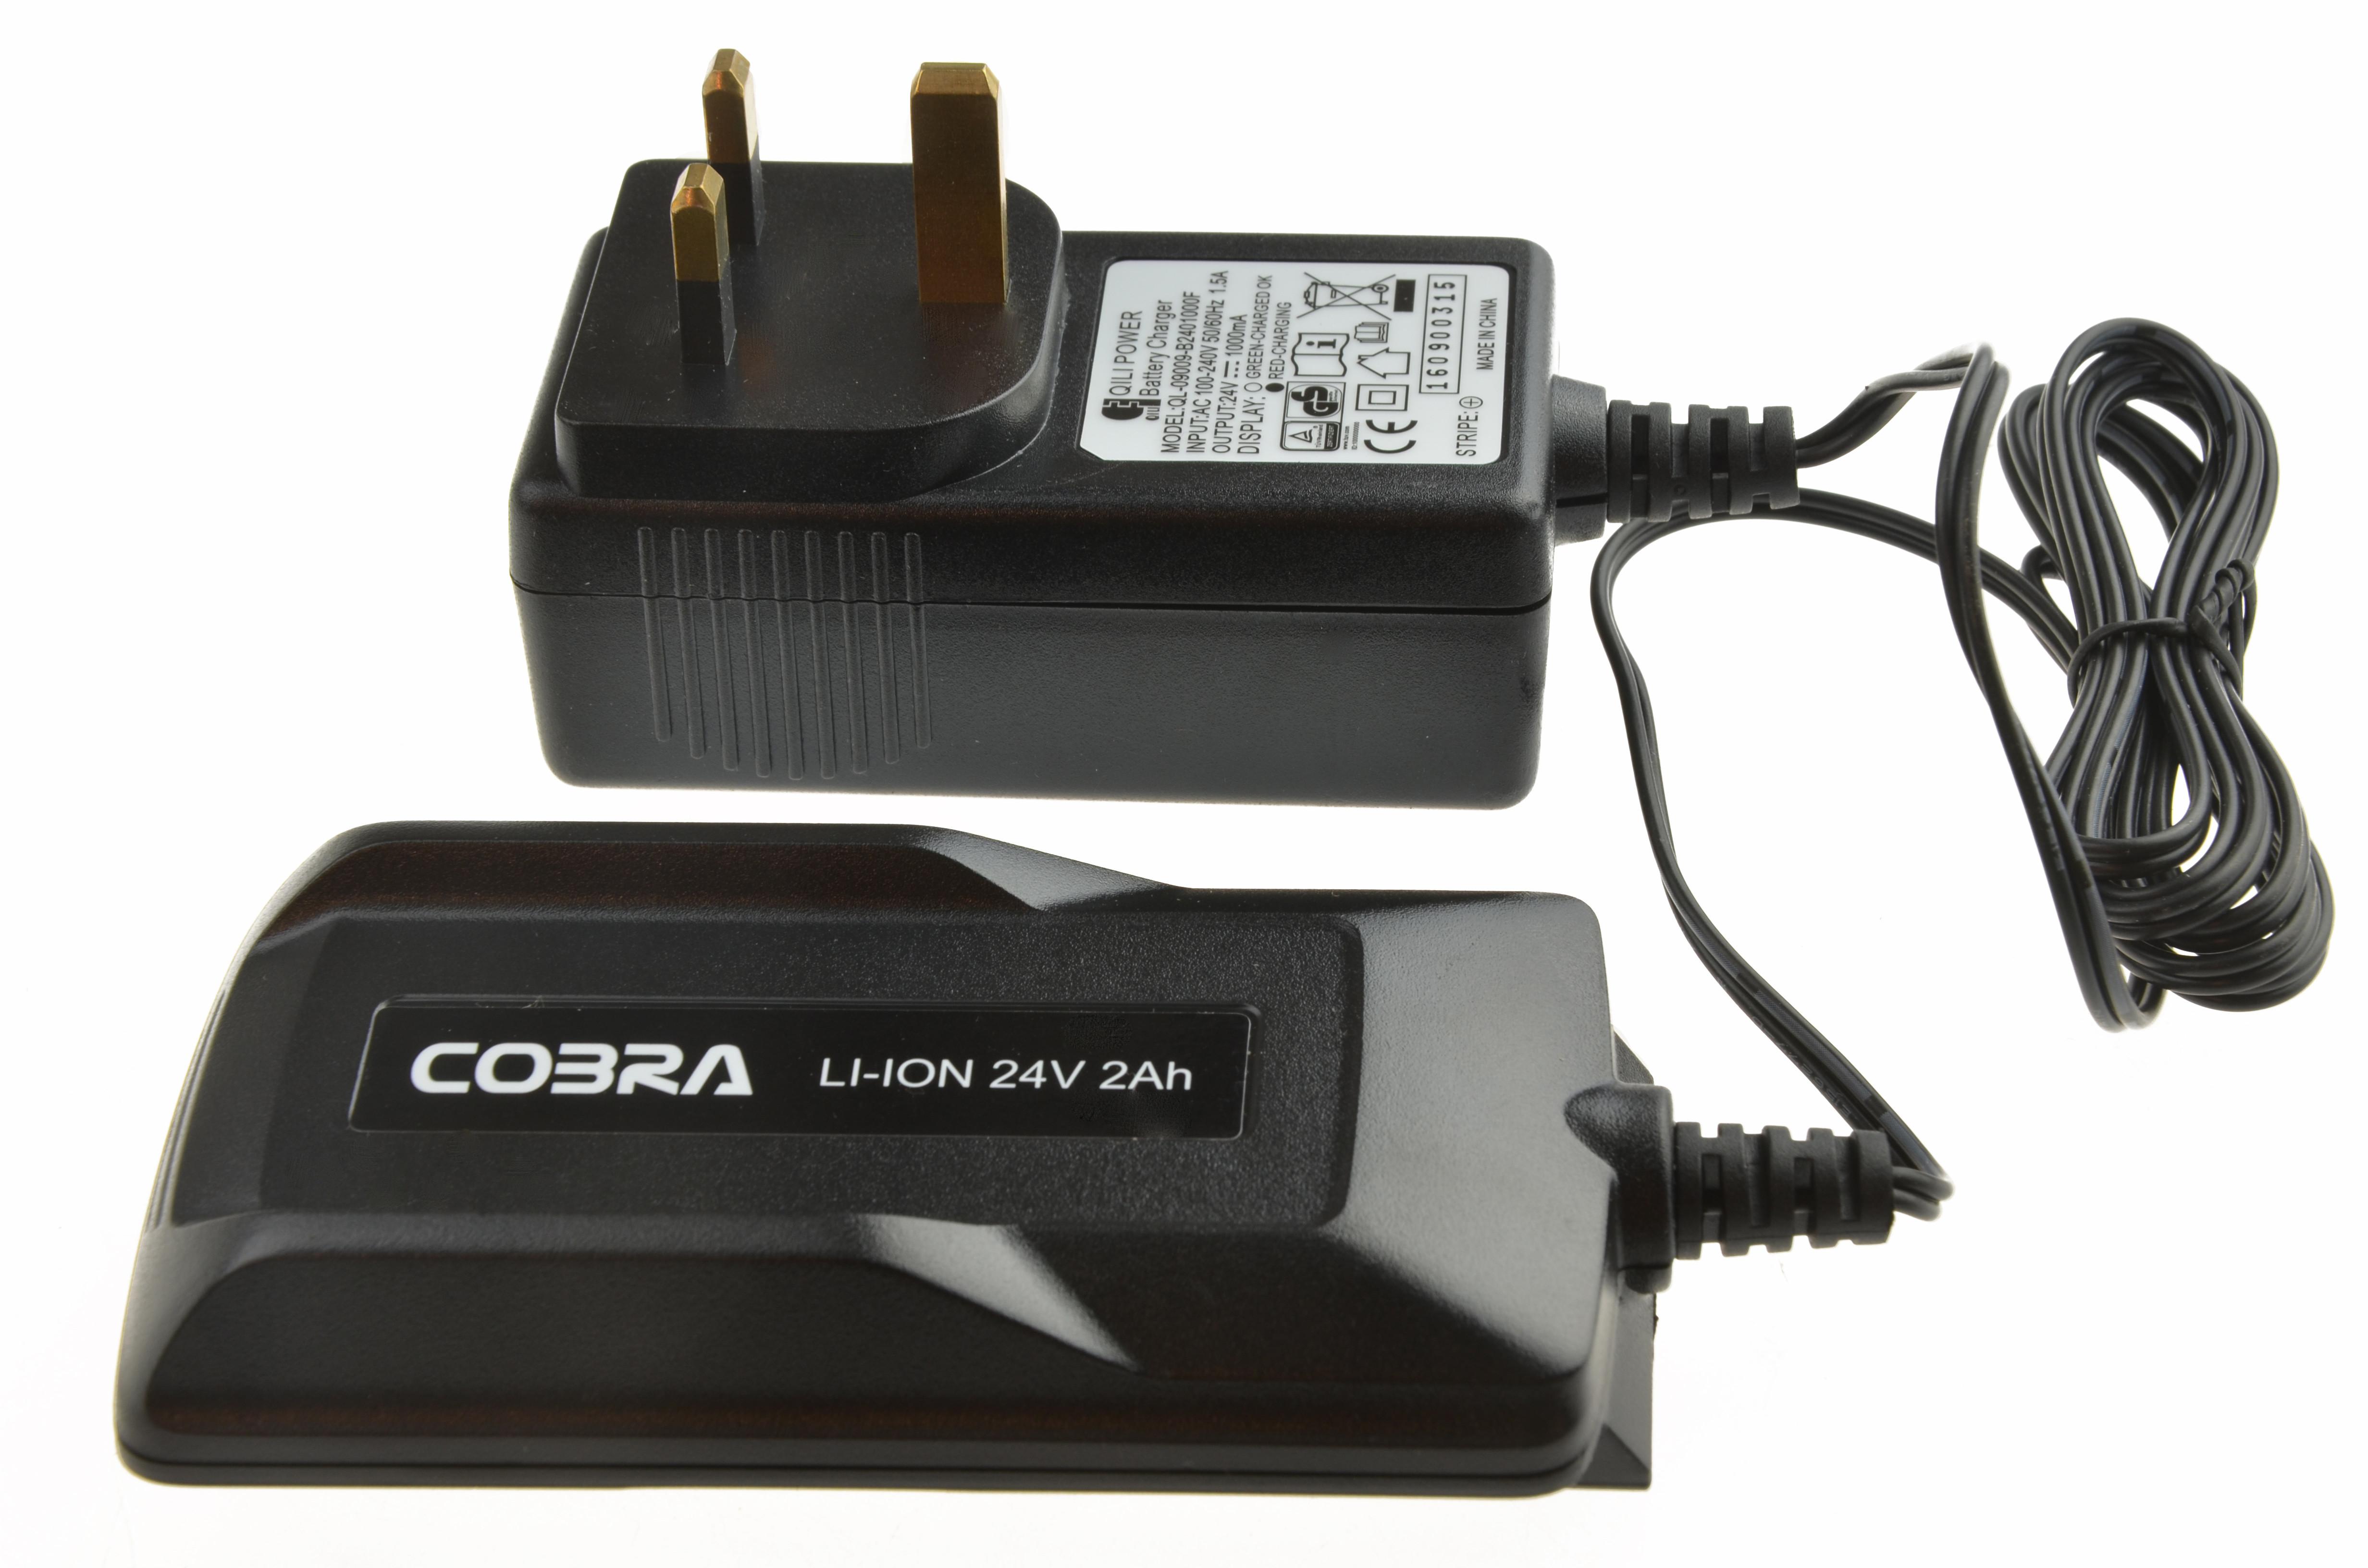 Cobra 24v Charger